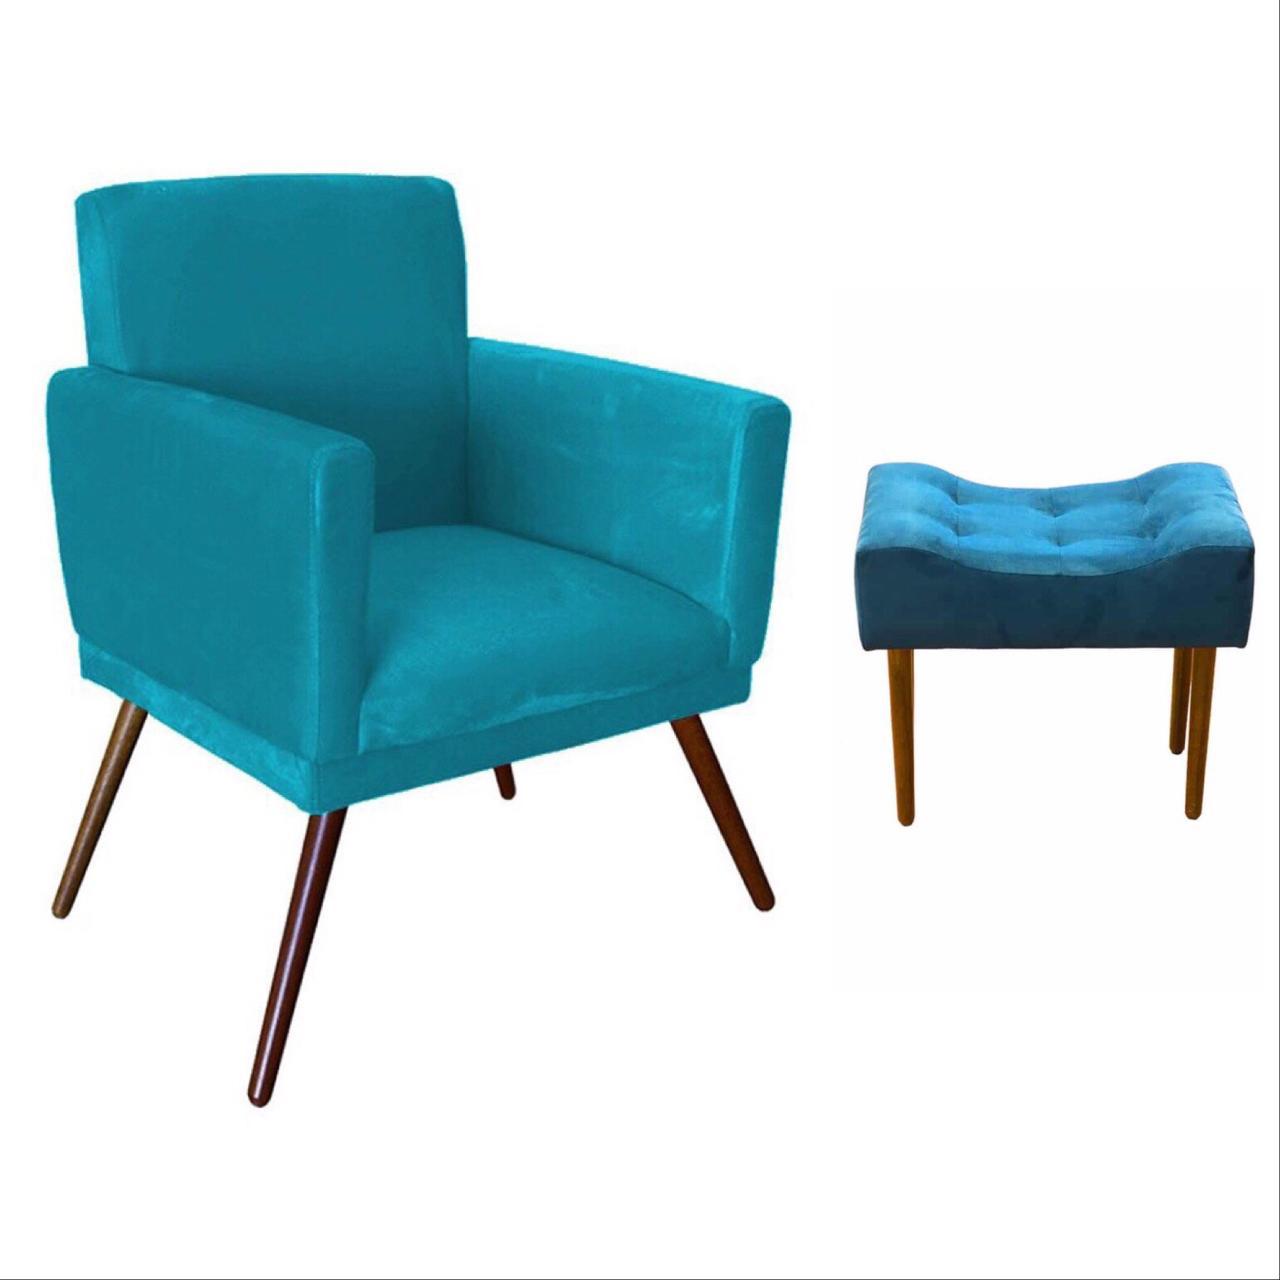 Kit Poltrona Decorativa Nina com rodapé e Puff retangular Azul